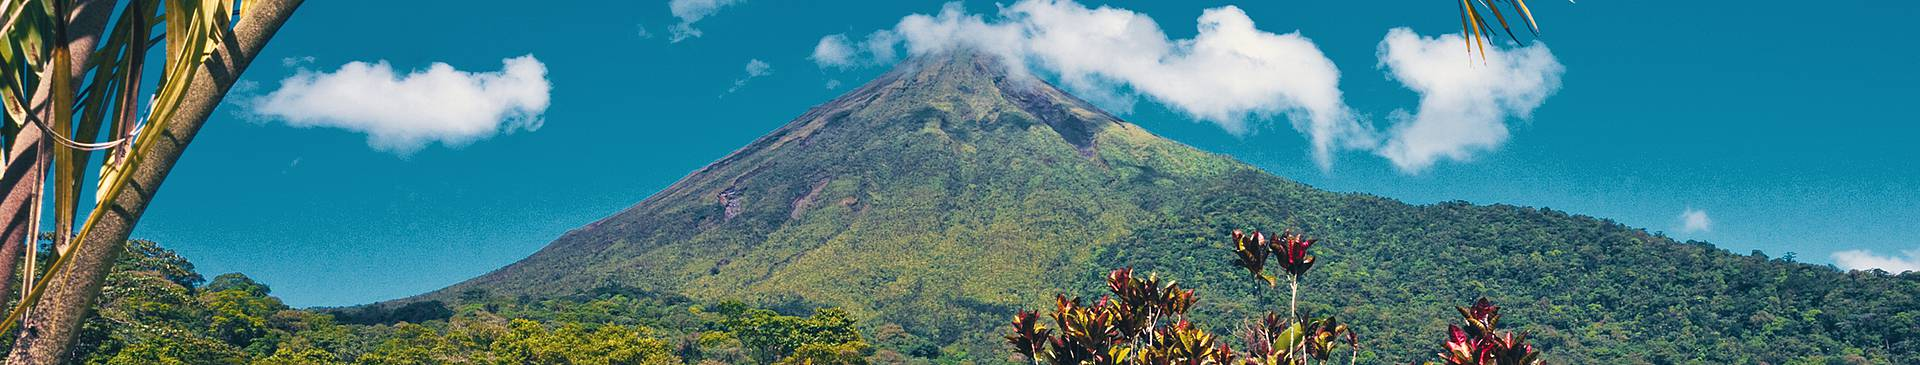 Viaggi in Costa Rica in estate